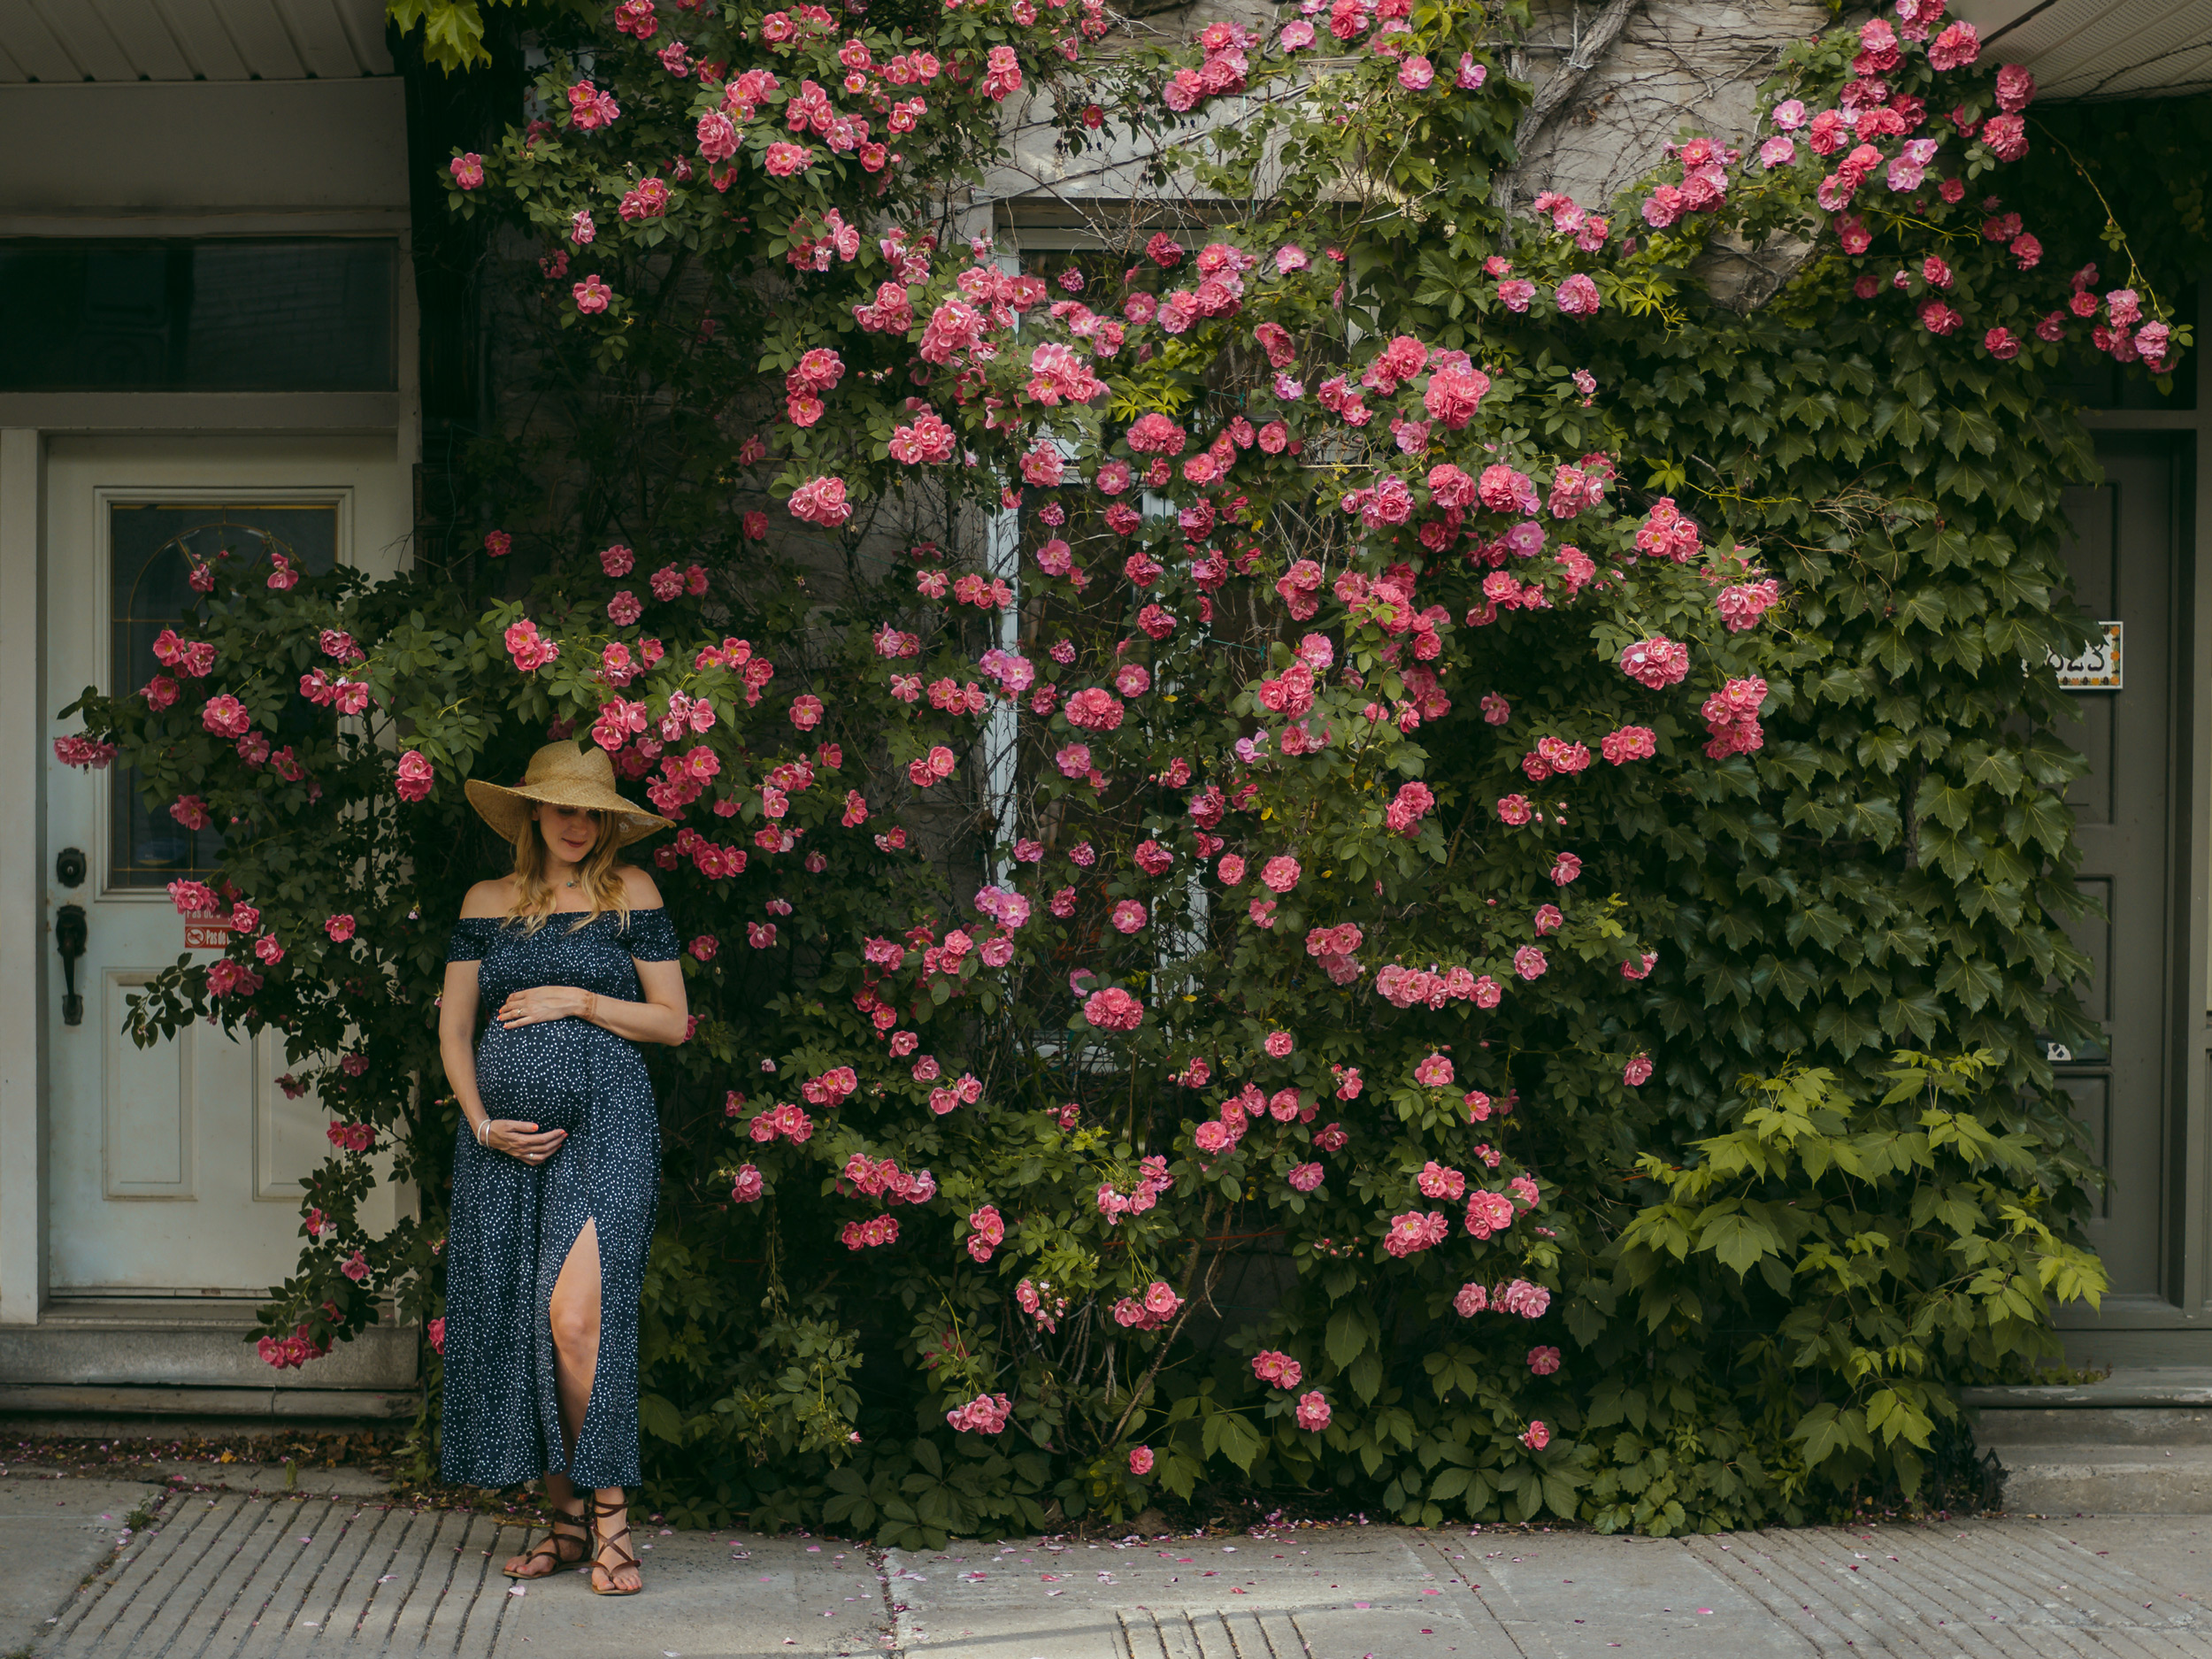 montreal-grossesse-maternite-photo-415-5